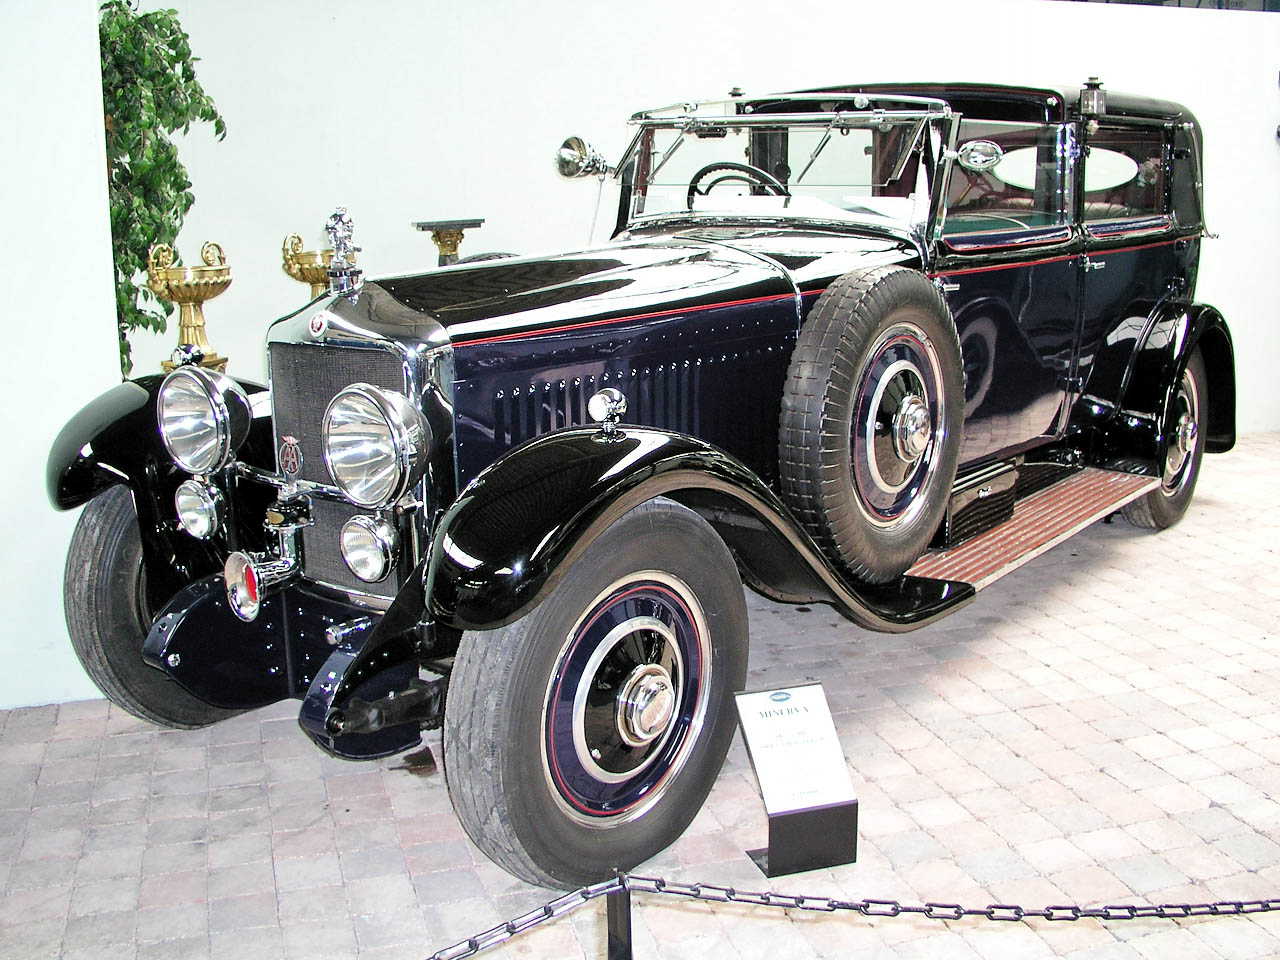 file 1928 minerva ak 32 cv coupe chauffeur by d u0026 39 ieteren